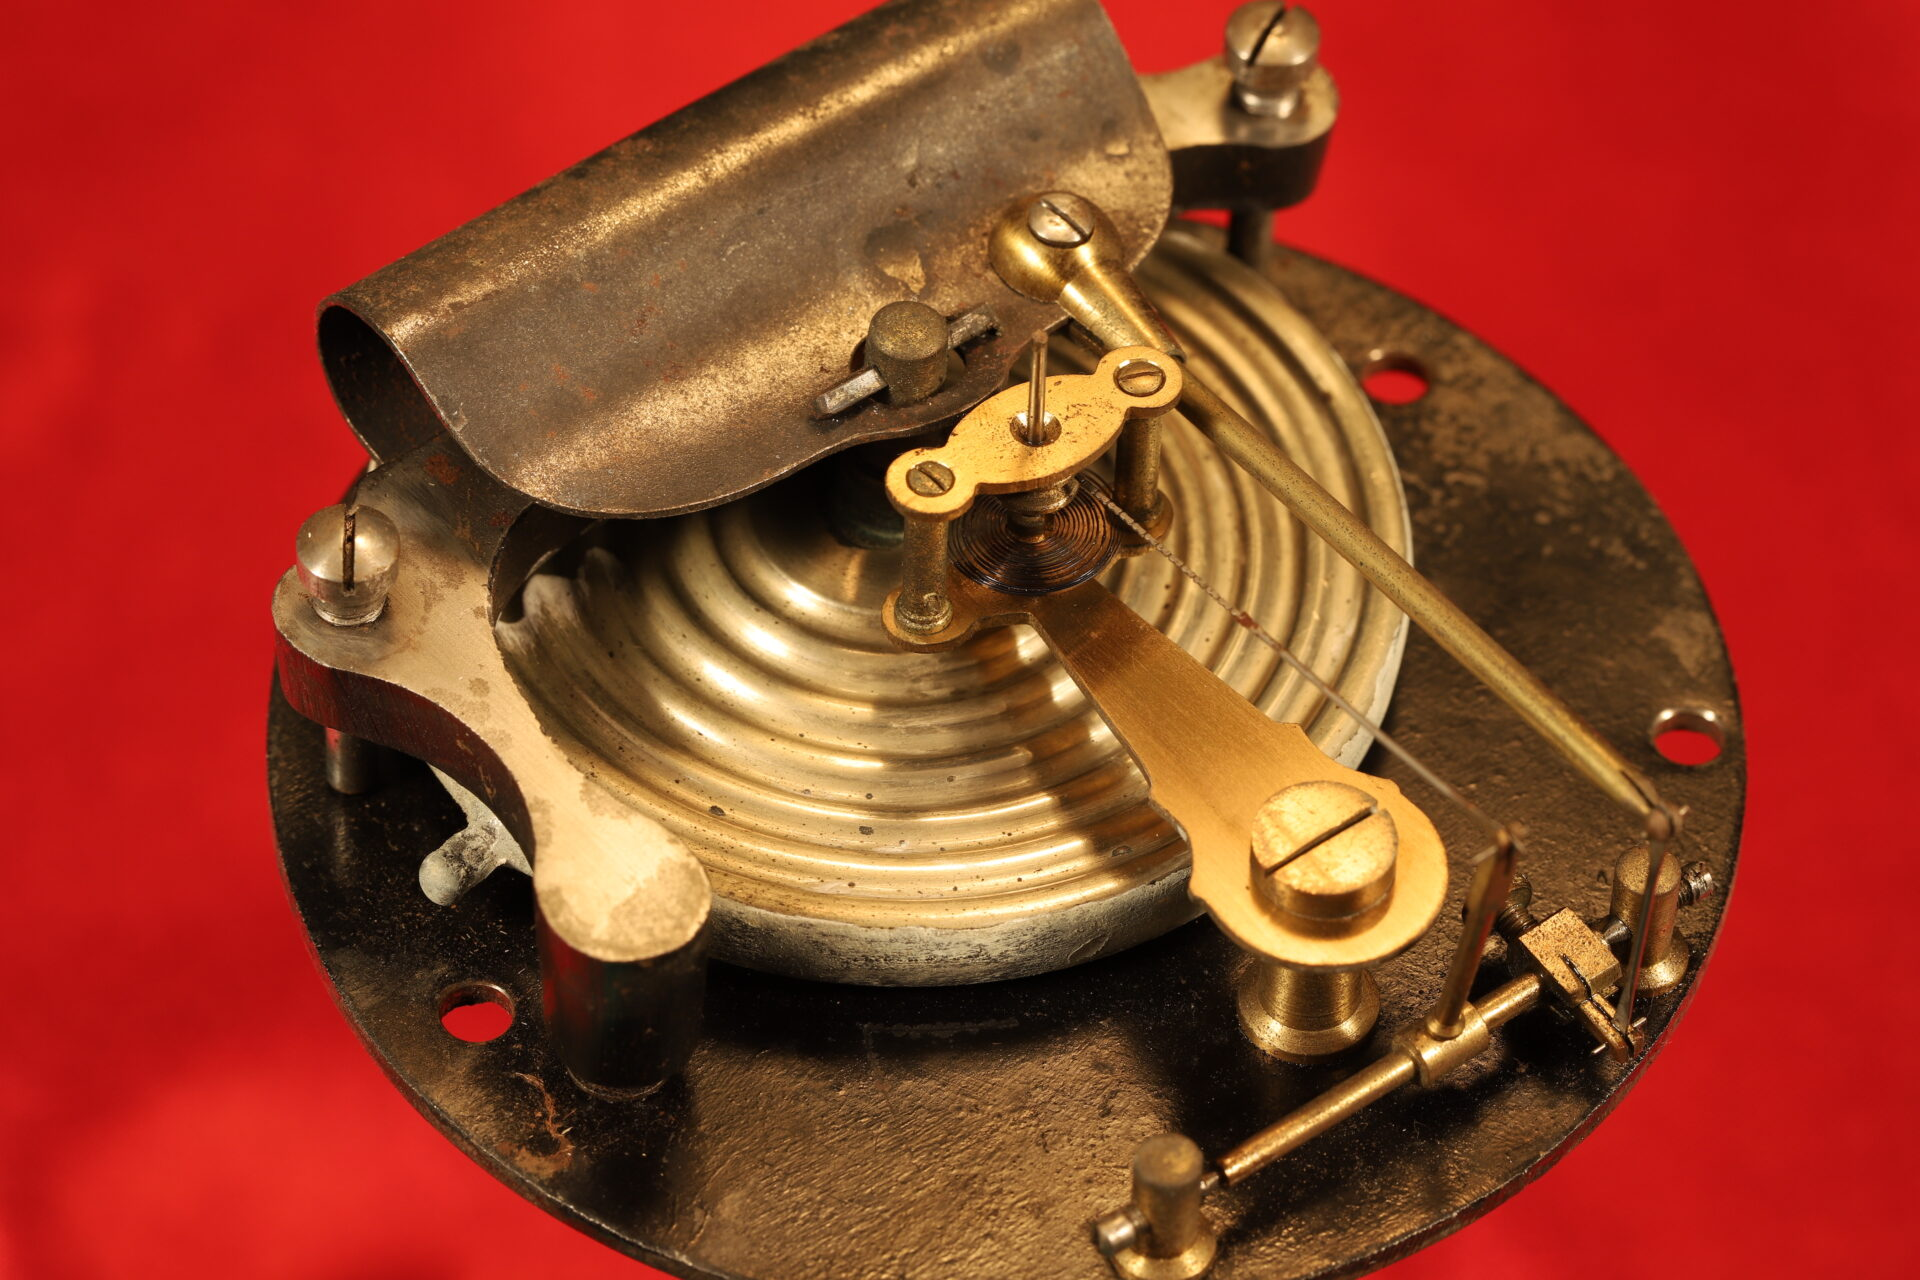 Image of movement for Dollond Royal Standard Marine Barometer c1880